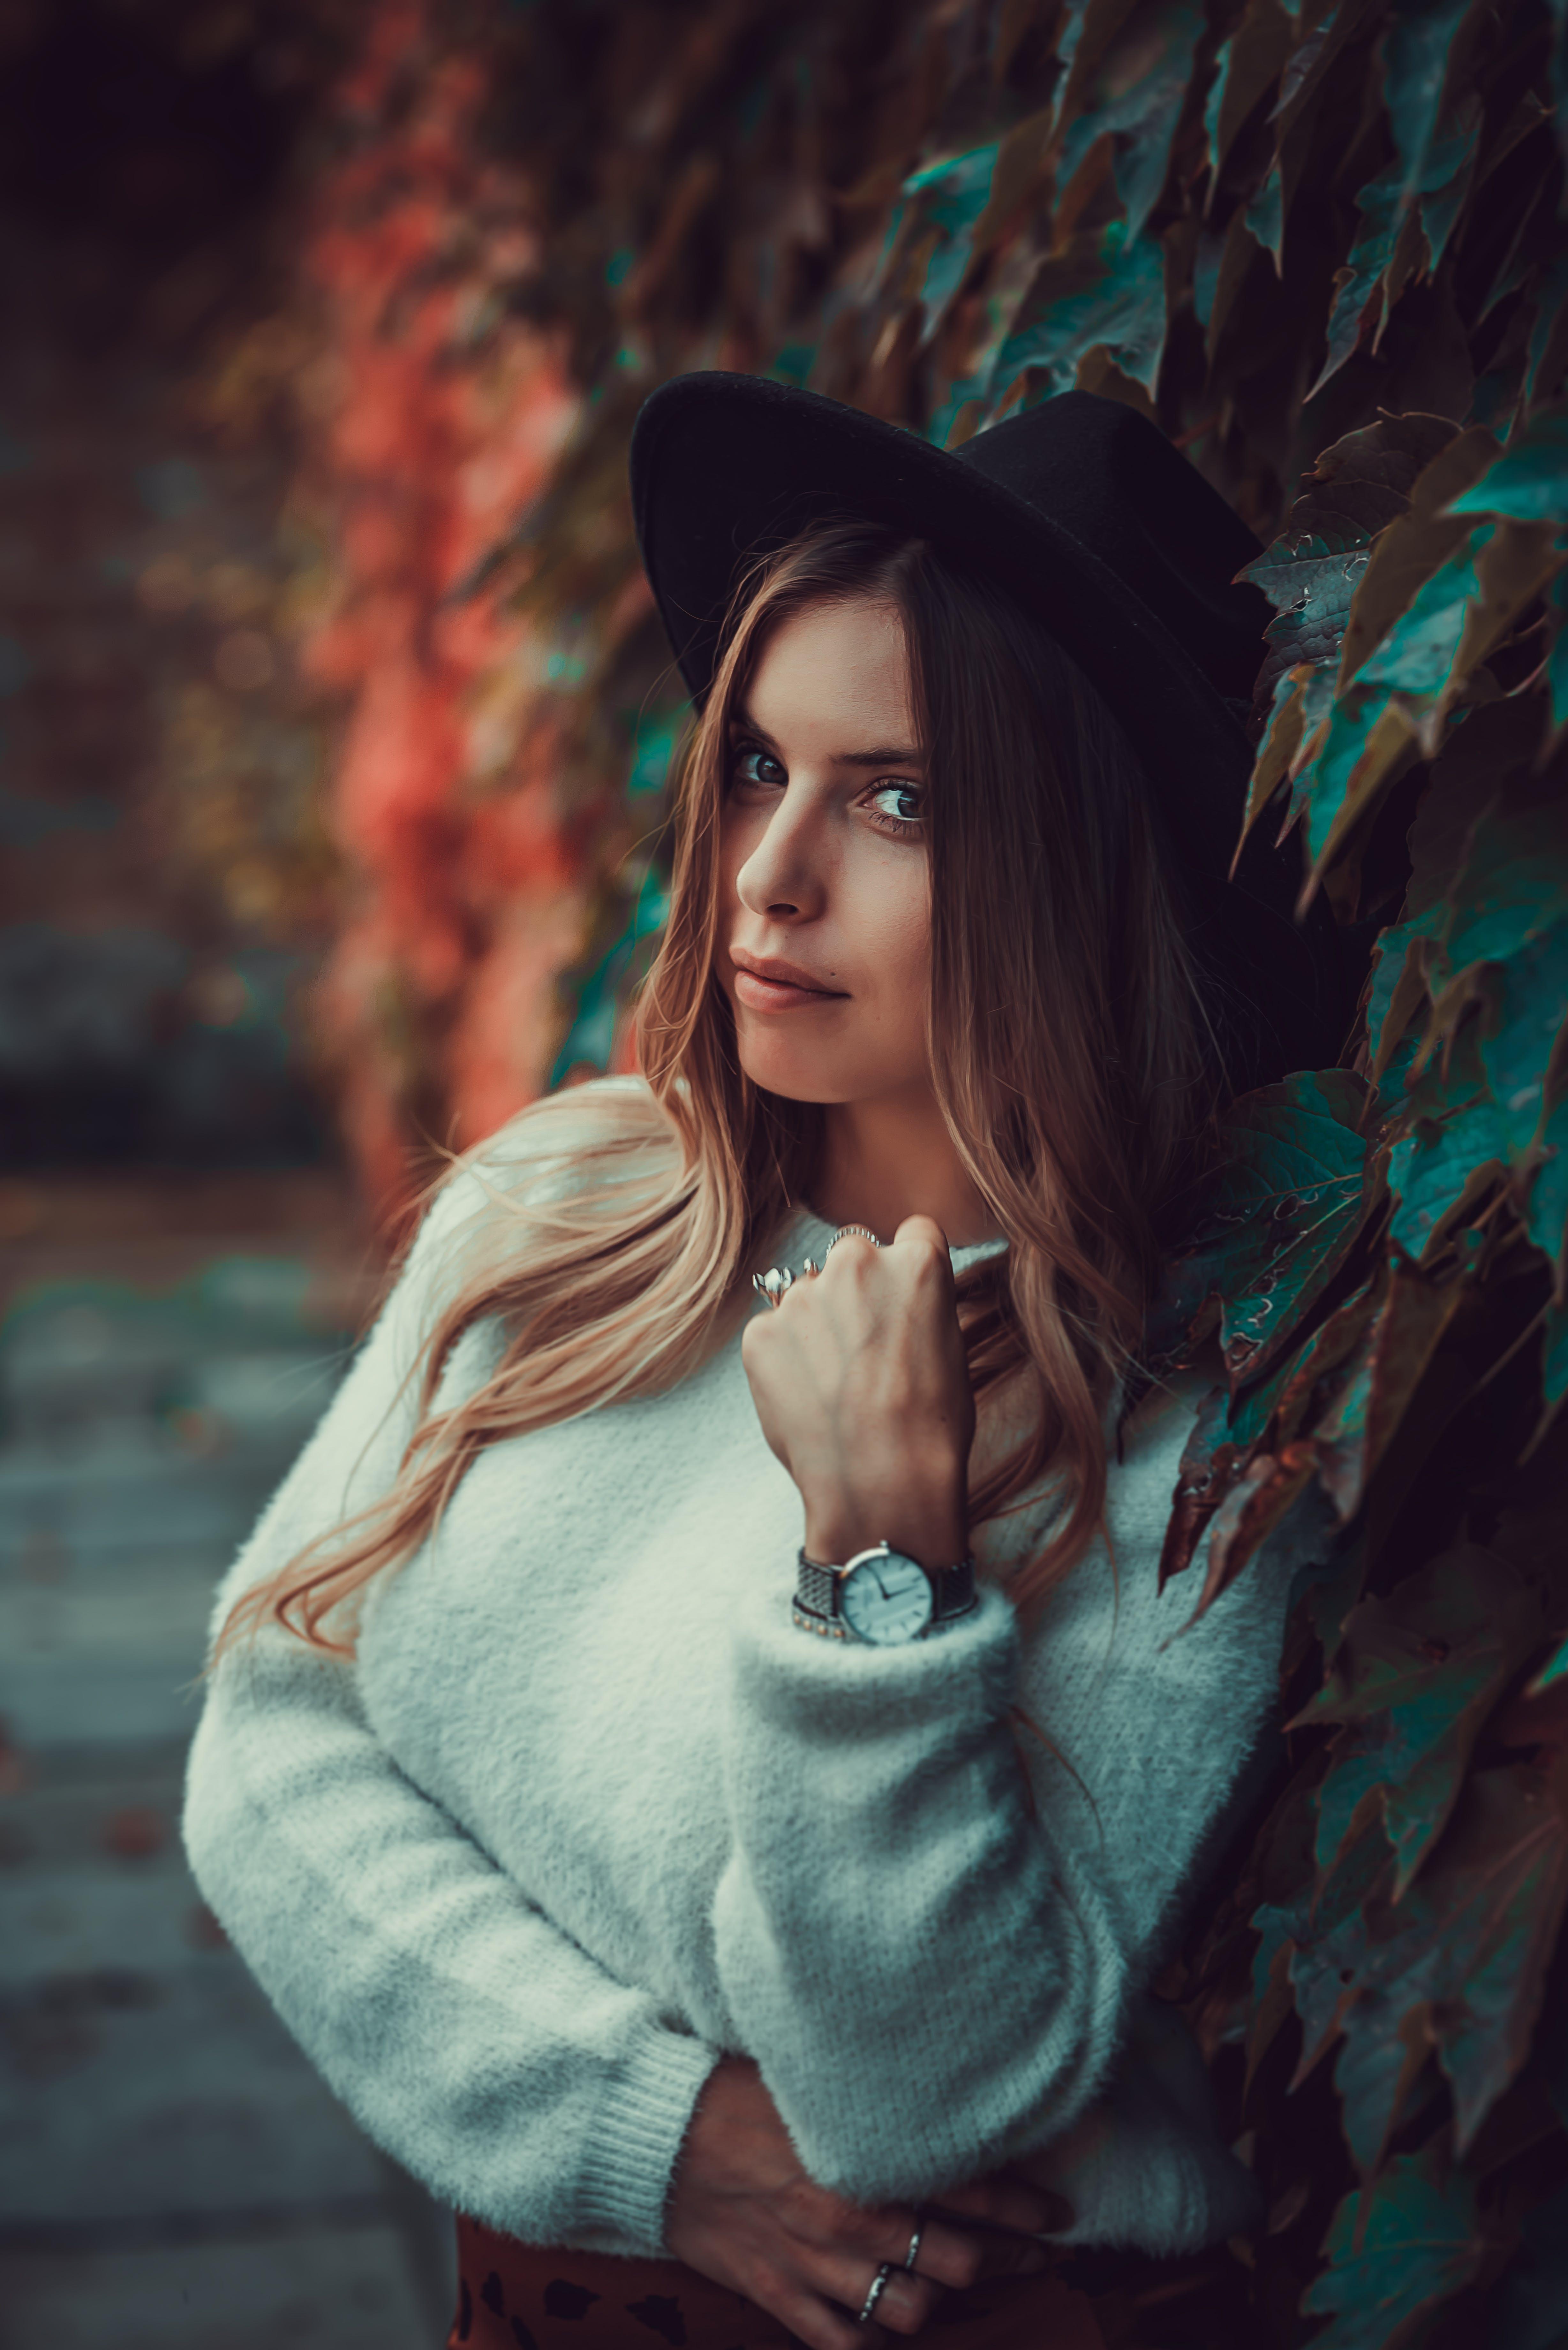 Základová fotografie zdarma na téma atraktivní, bílý svetr, blond vlasy, dáma